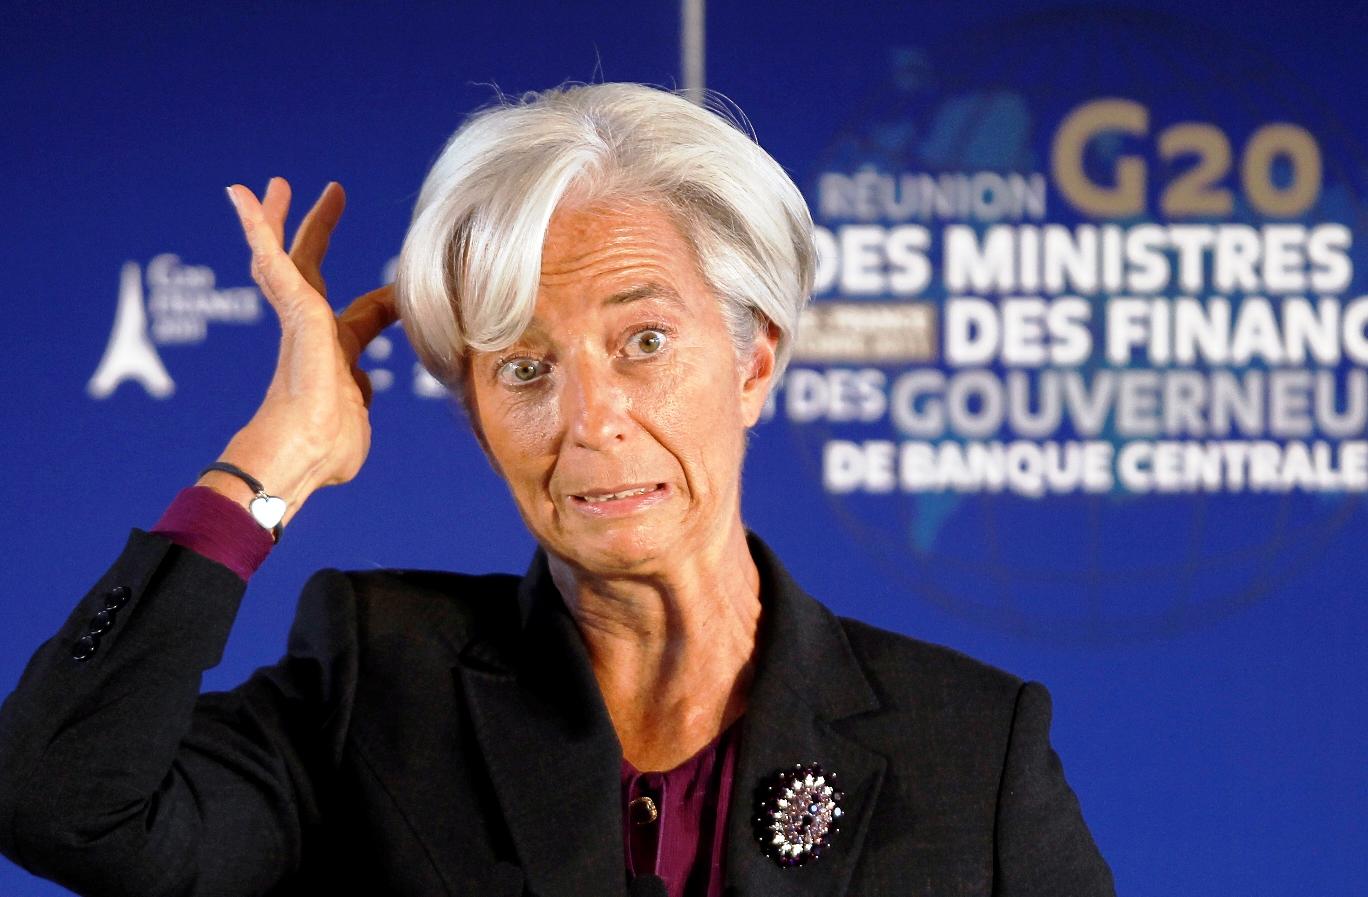 WSJ: Πότε θα ζητήσει συγνώμη το ΔΝΤ από την Ελλάδα;